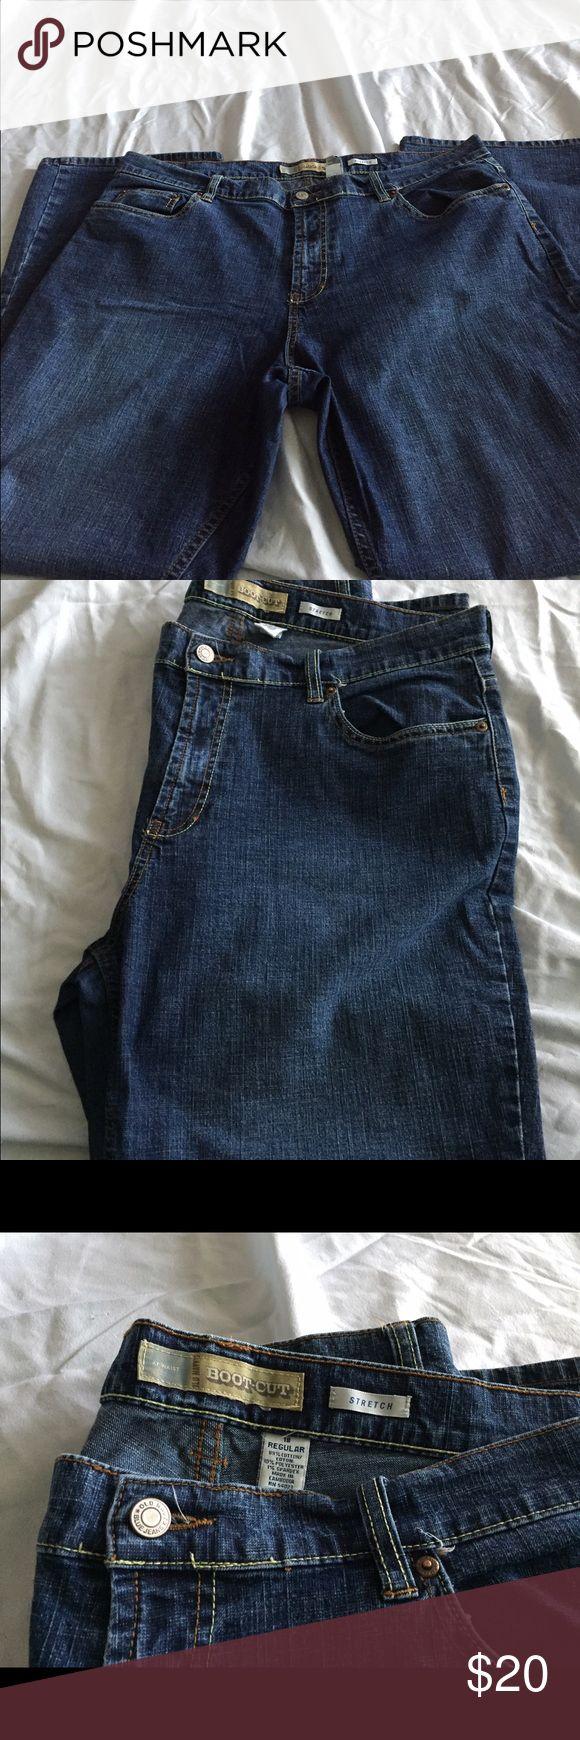 Old Navy Stretch Jeans Old Navy Denim Stretch Jeans Old Navy Jeans Flare & Wide Leg